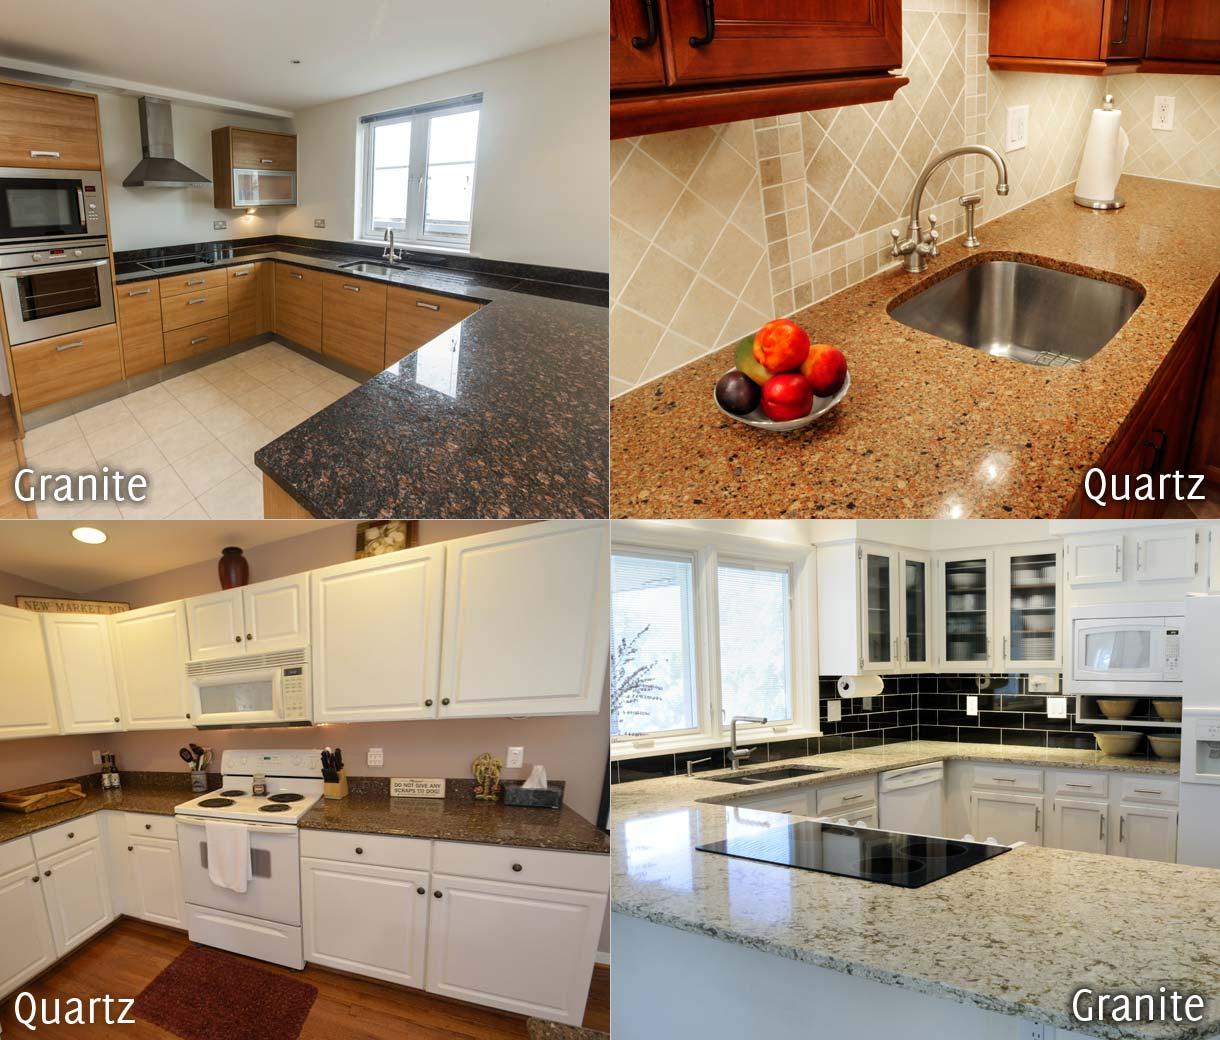 Quartz And Granite Kitchens: 1000+ Images About KITCHEN On Pinterest